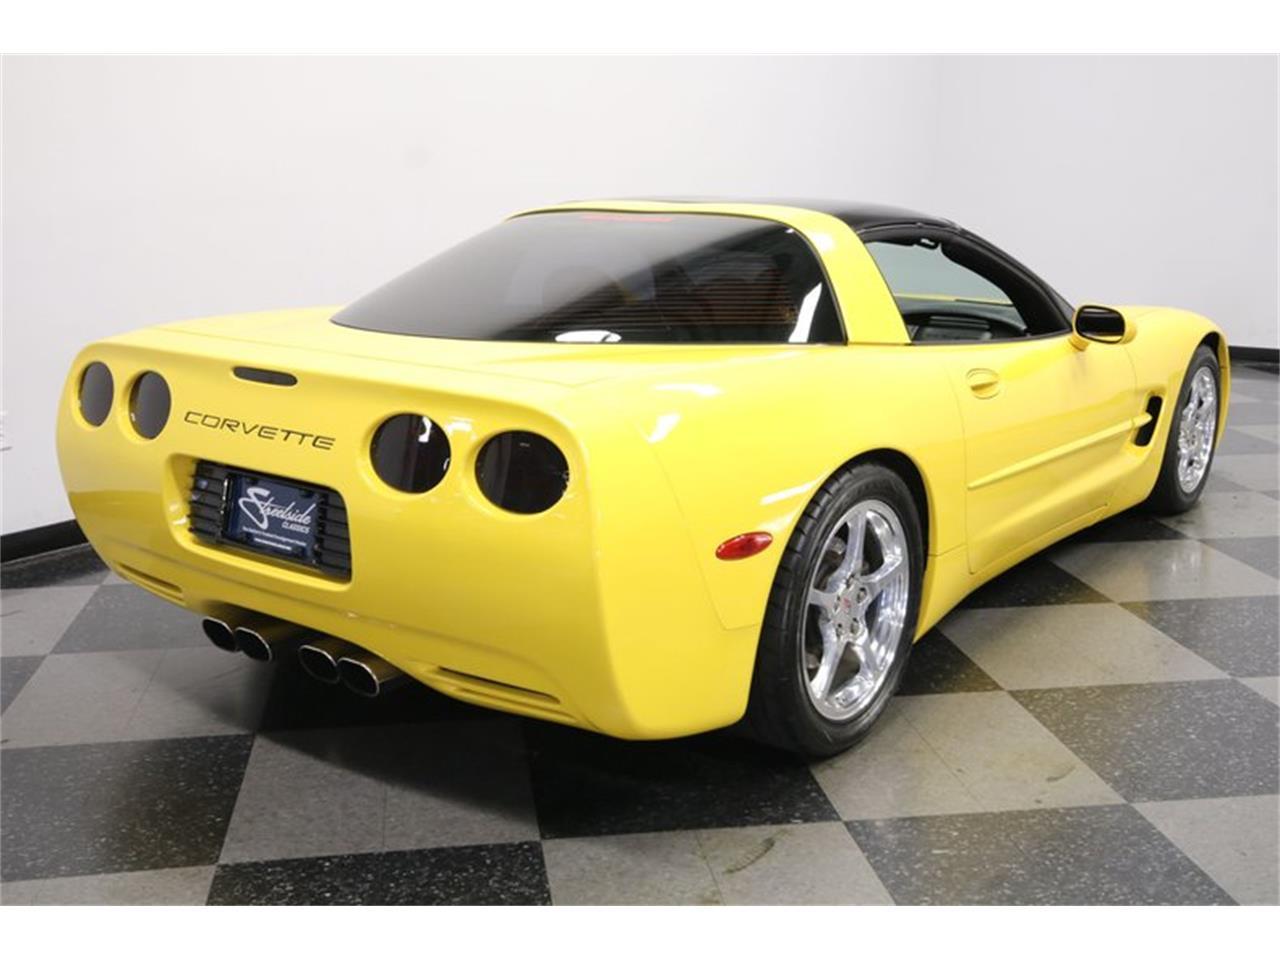 2001 Chevrolet Corvette (CC-1356375) for sale in Lutz, Florida